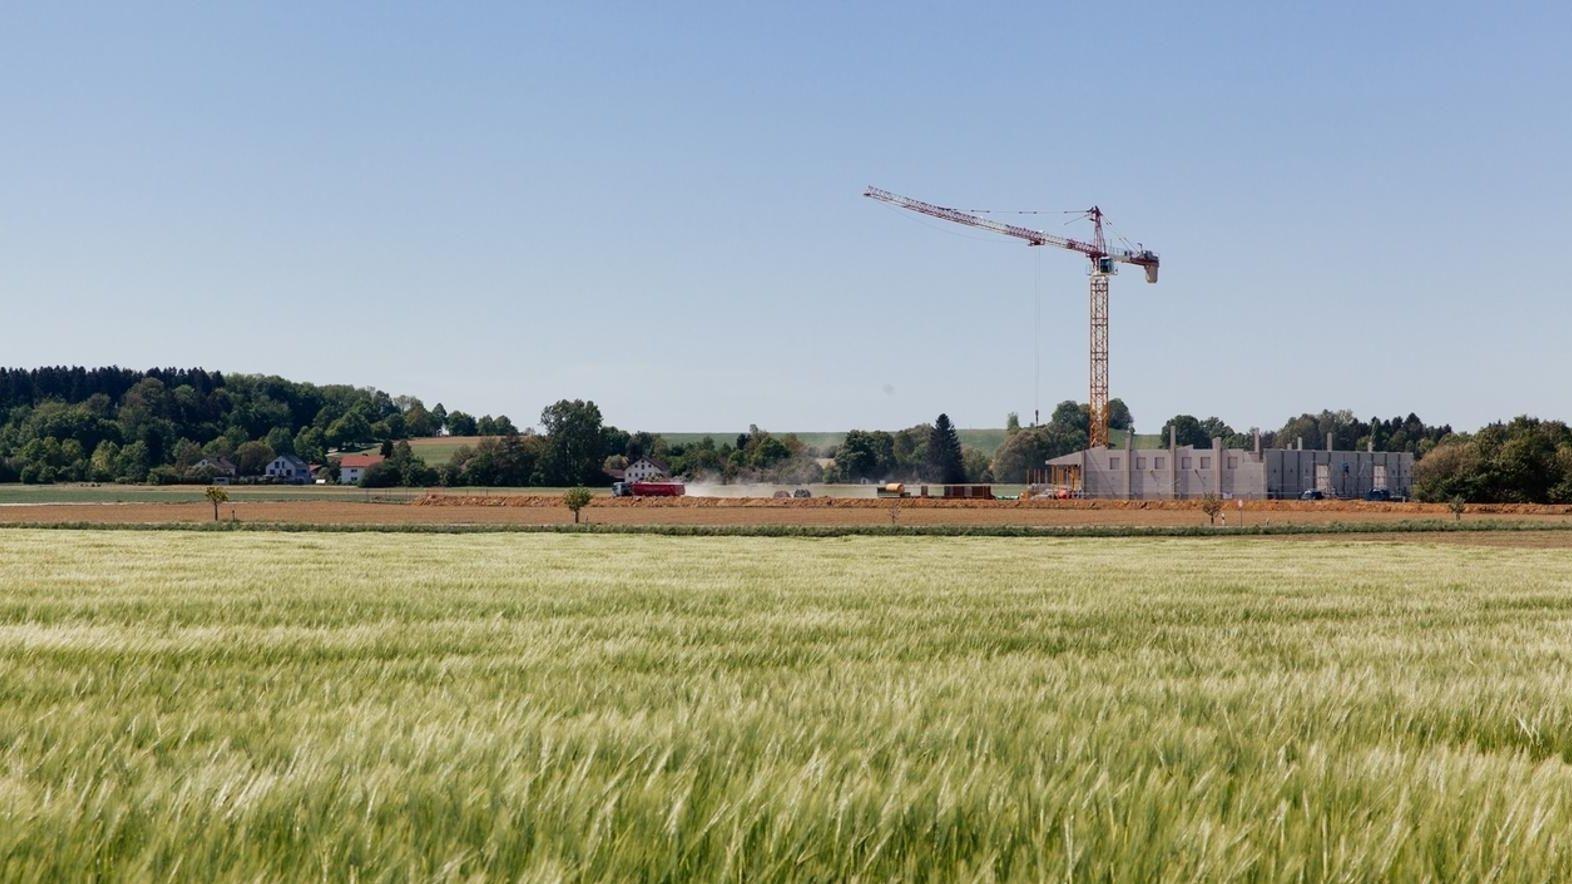 Bau am Rande eines Kornfelds